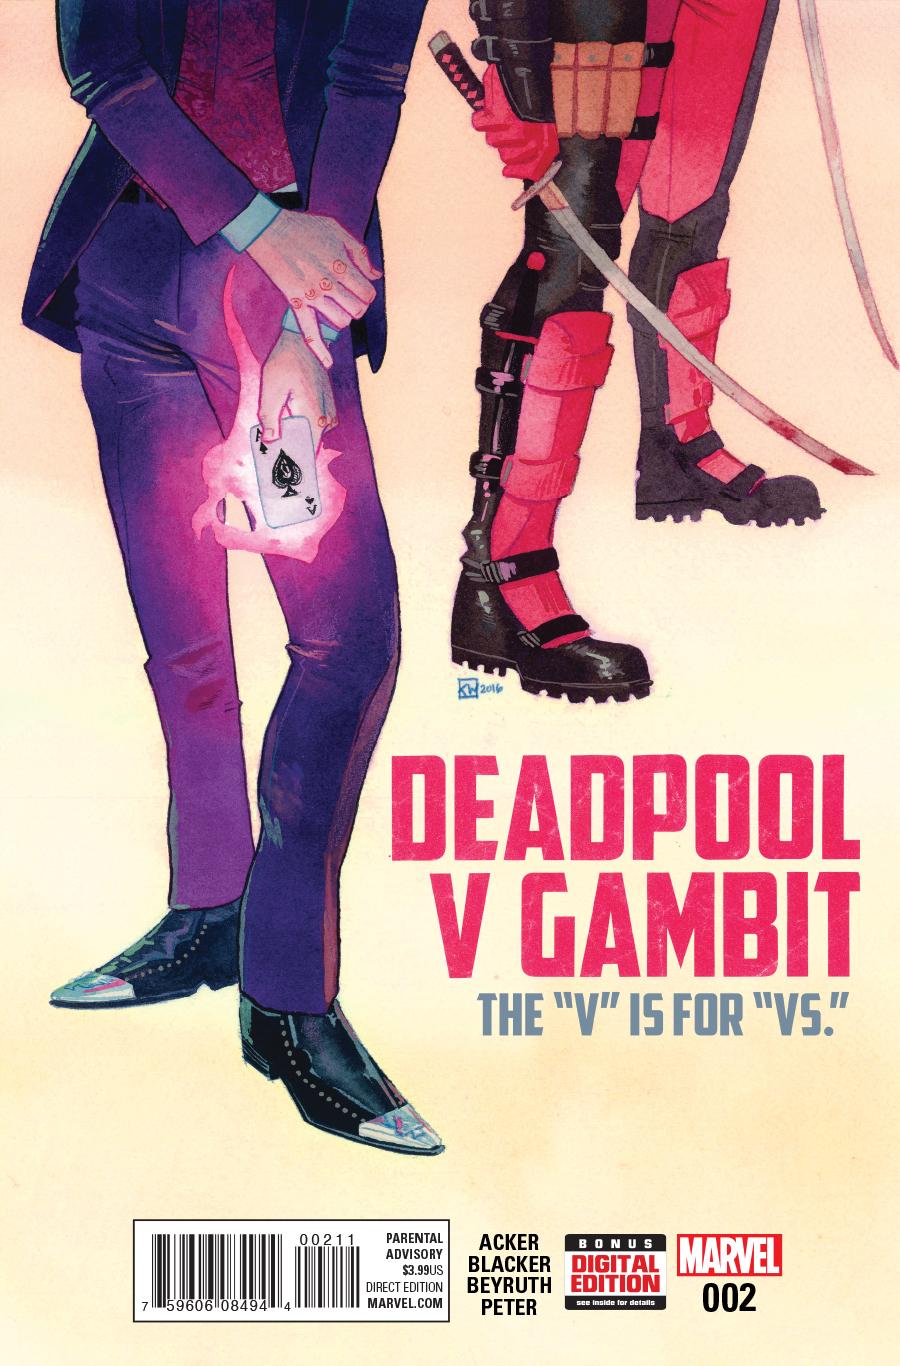 Deadpool v Gambit #3